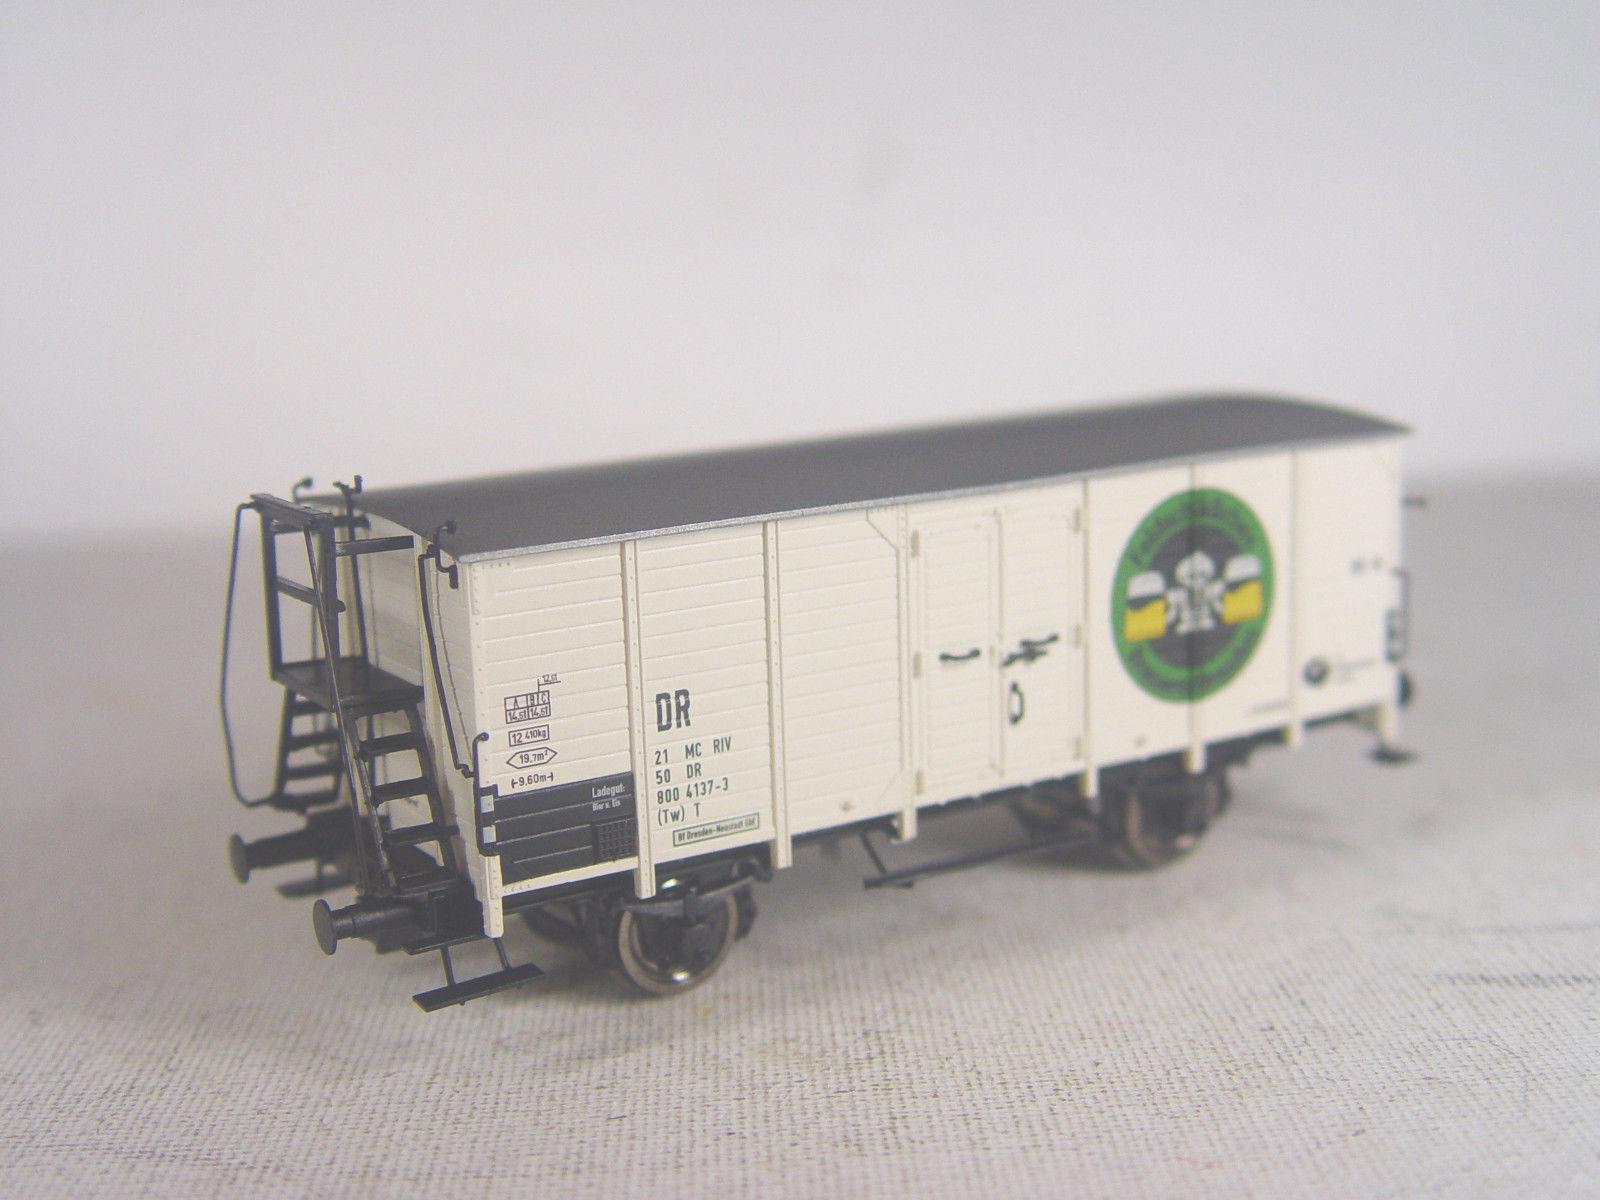 DR  Bierwagen G10 - Feldschlösschen    - Brawa HO Wagen 1 87 - 49087   E f08b6f